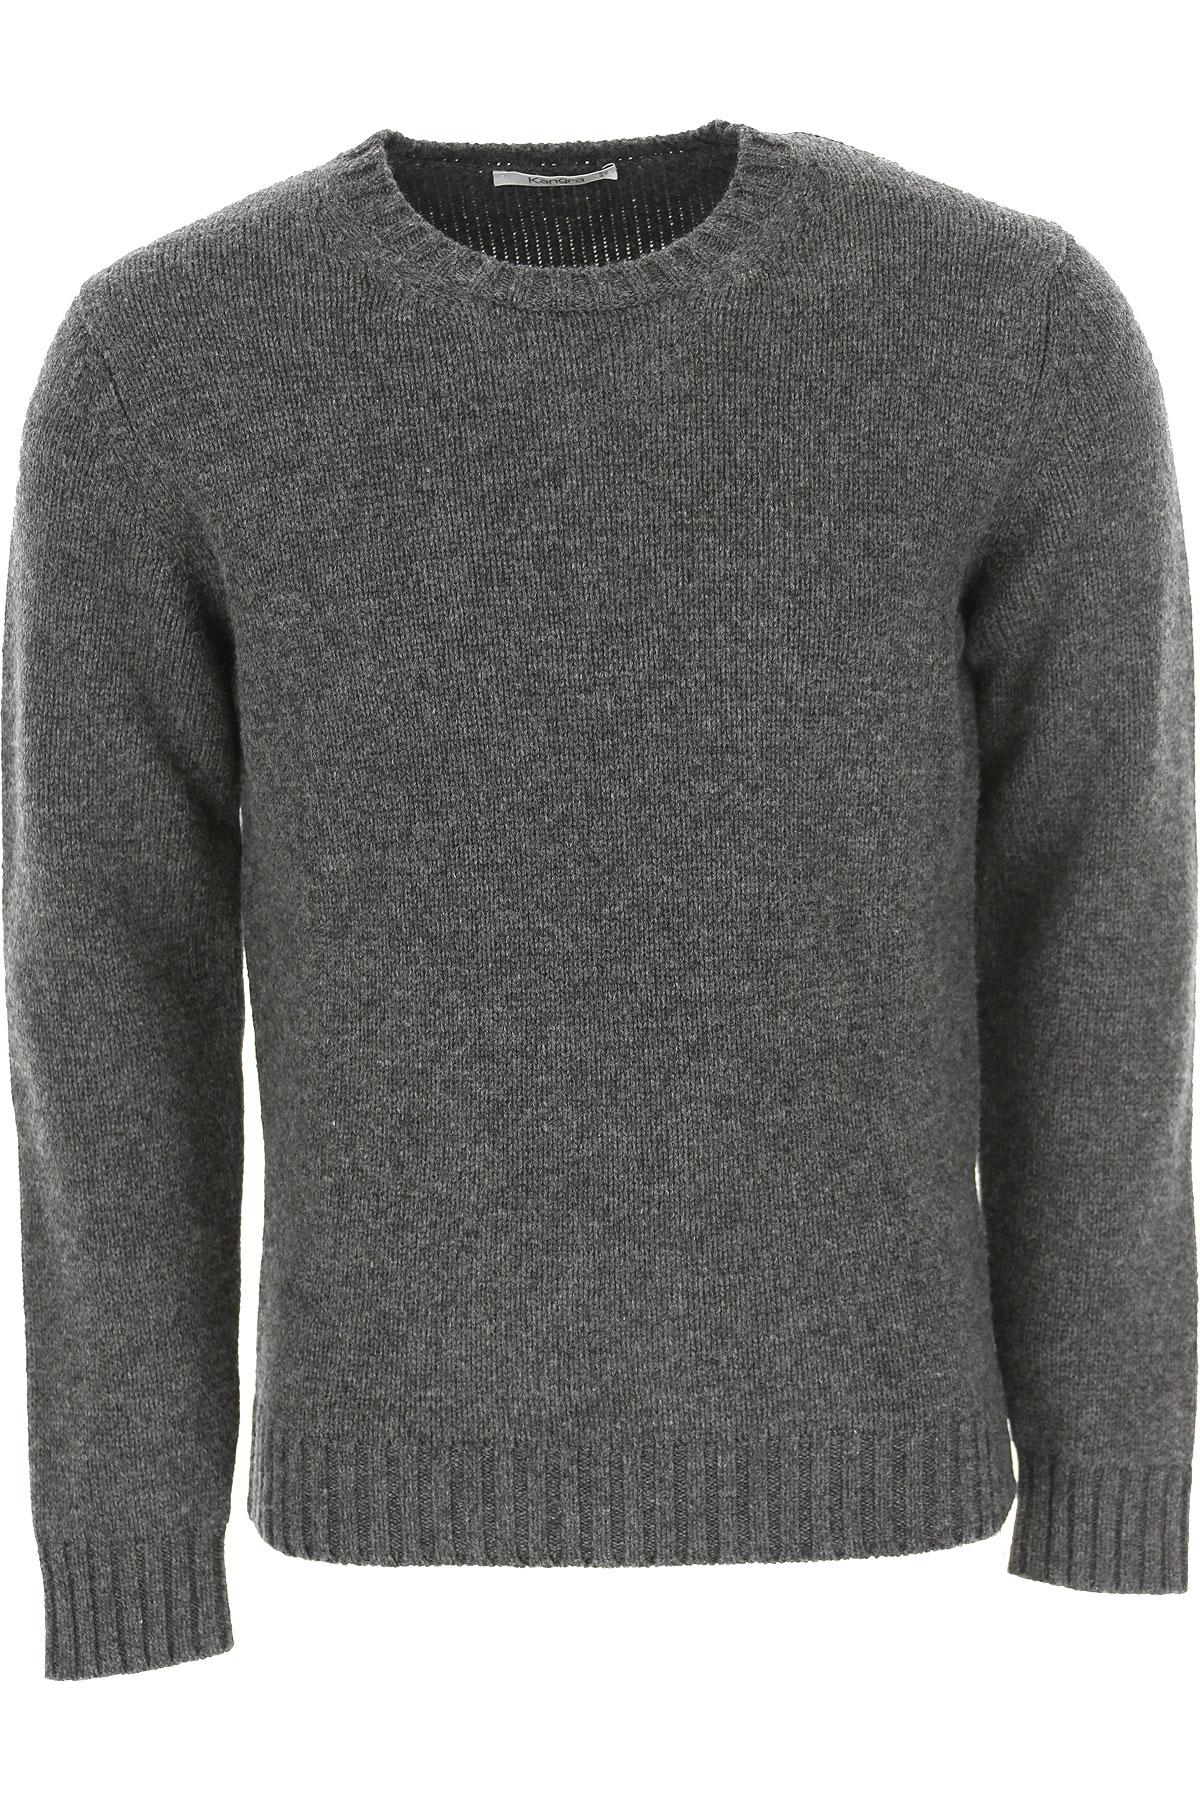 Kangra Sweater for Men Jumper On Sale, Asphalt Grey, Merinos Wool, 2019, L M XL XXL